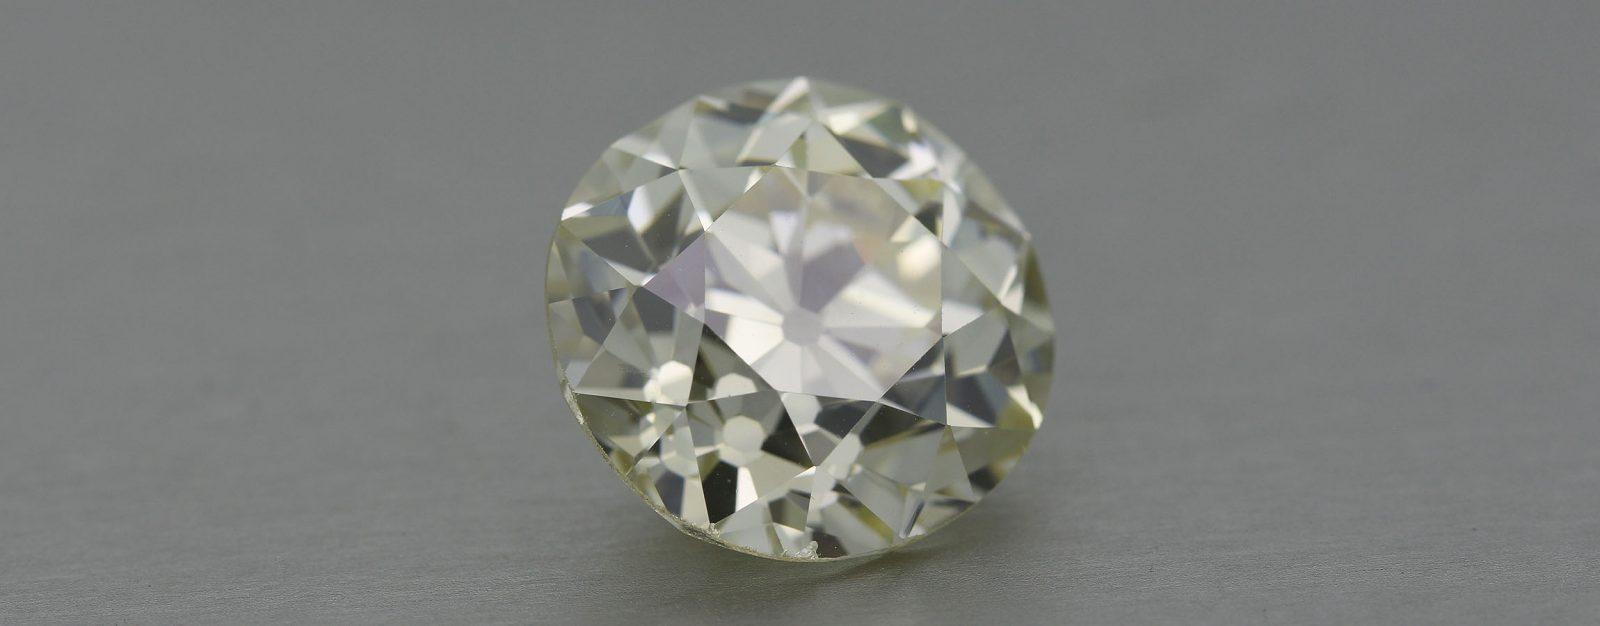 Antique Old European Cut Diamond